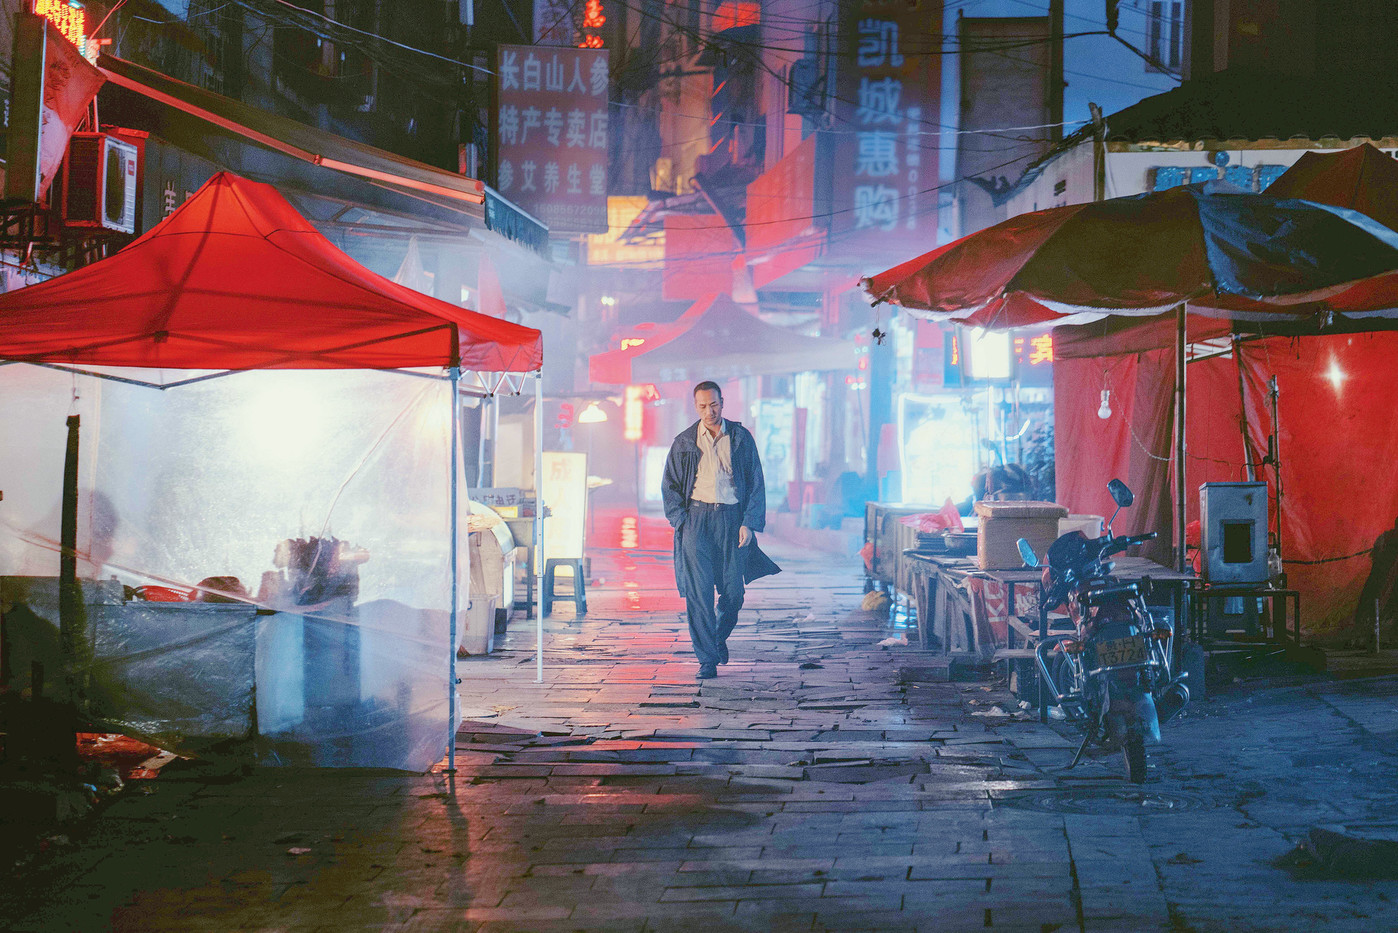 Un grand voyage vers la nuit de Bi Gan : un conte chinois hypnotique